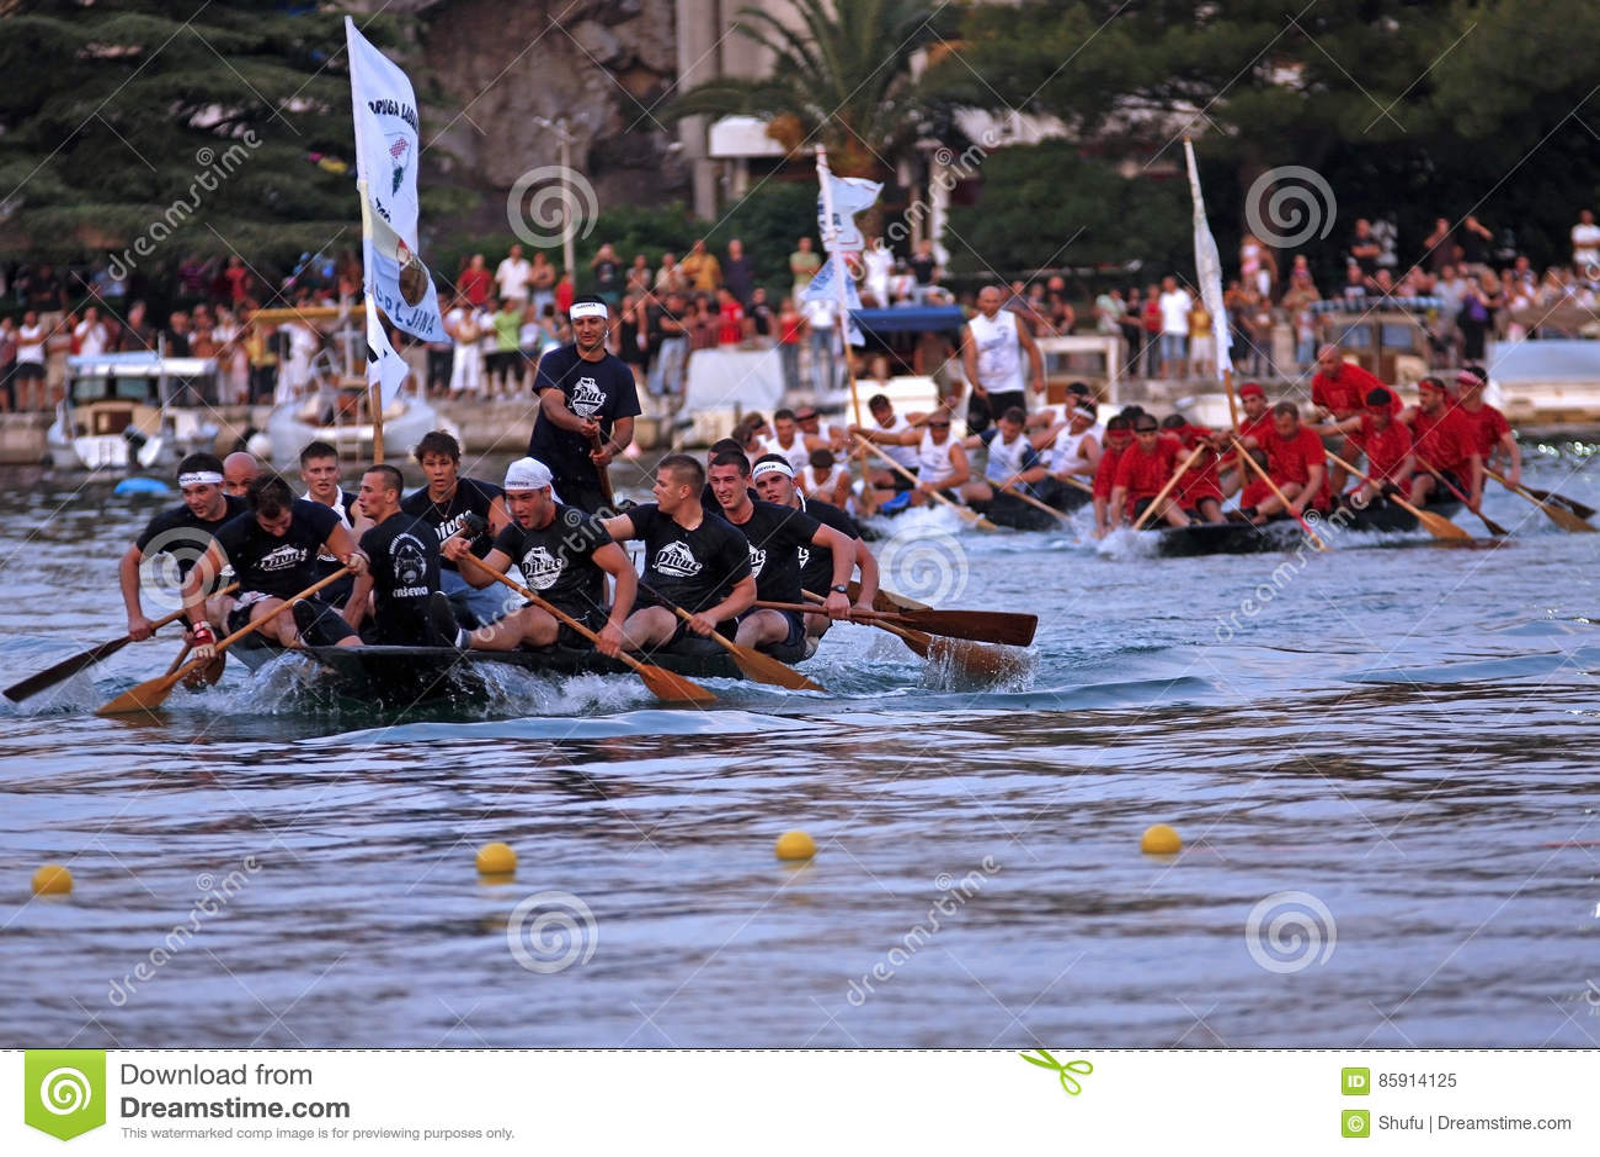 Finish line of a boat marathon on the Neretva River